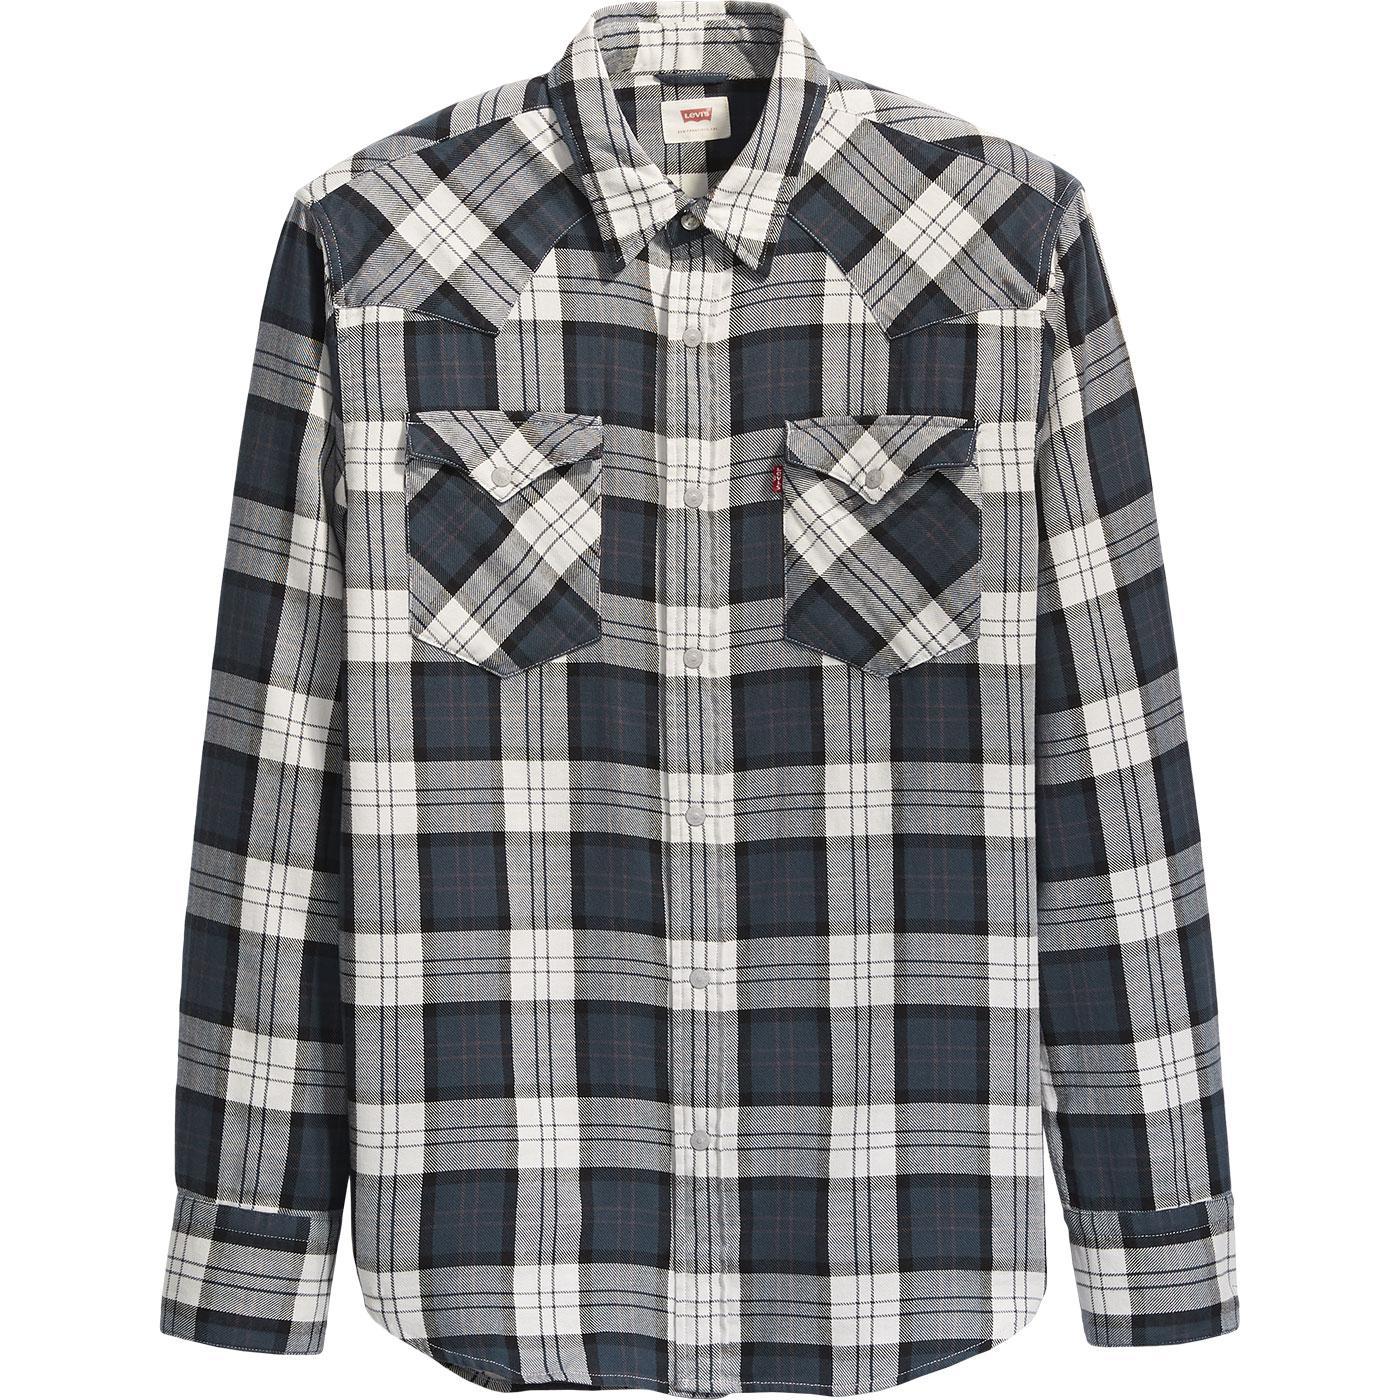 LEVI'S Barstow Retro Mod Check Western Shirt (ACD)